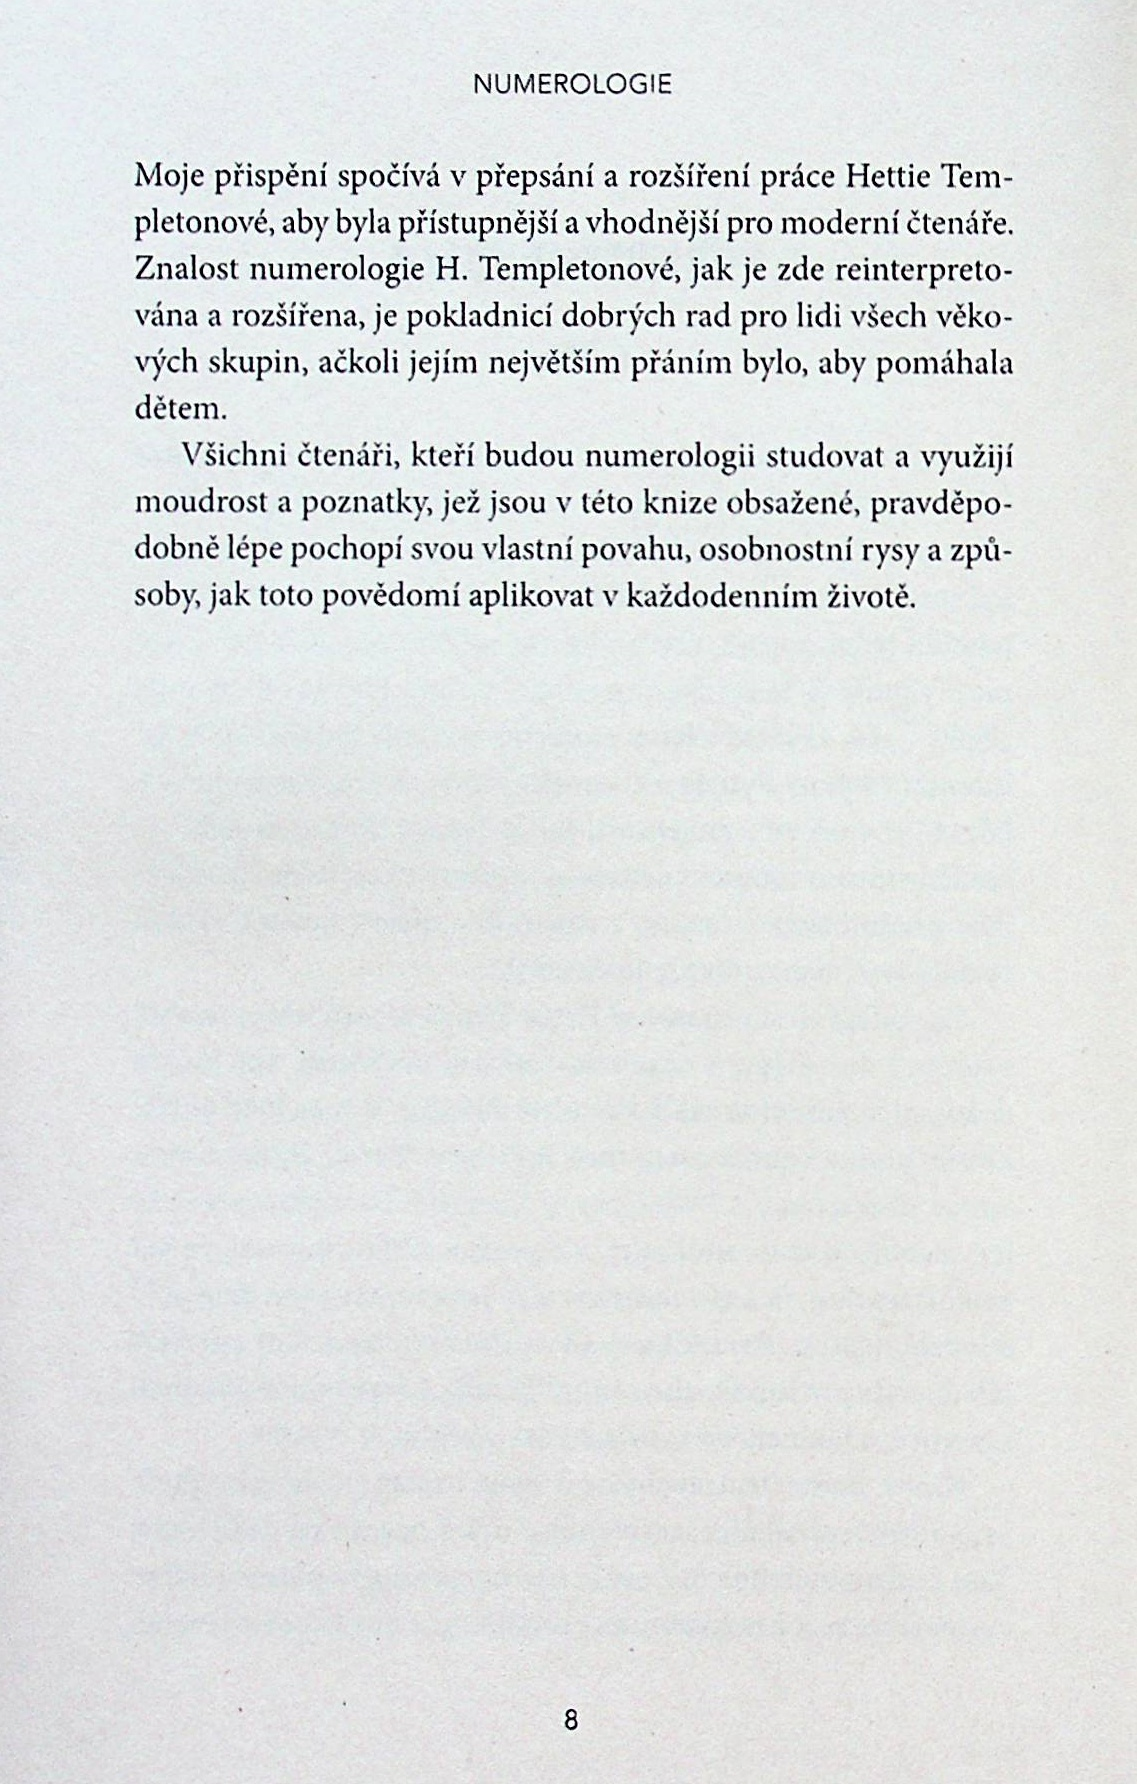 small-list